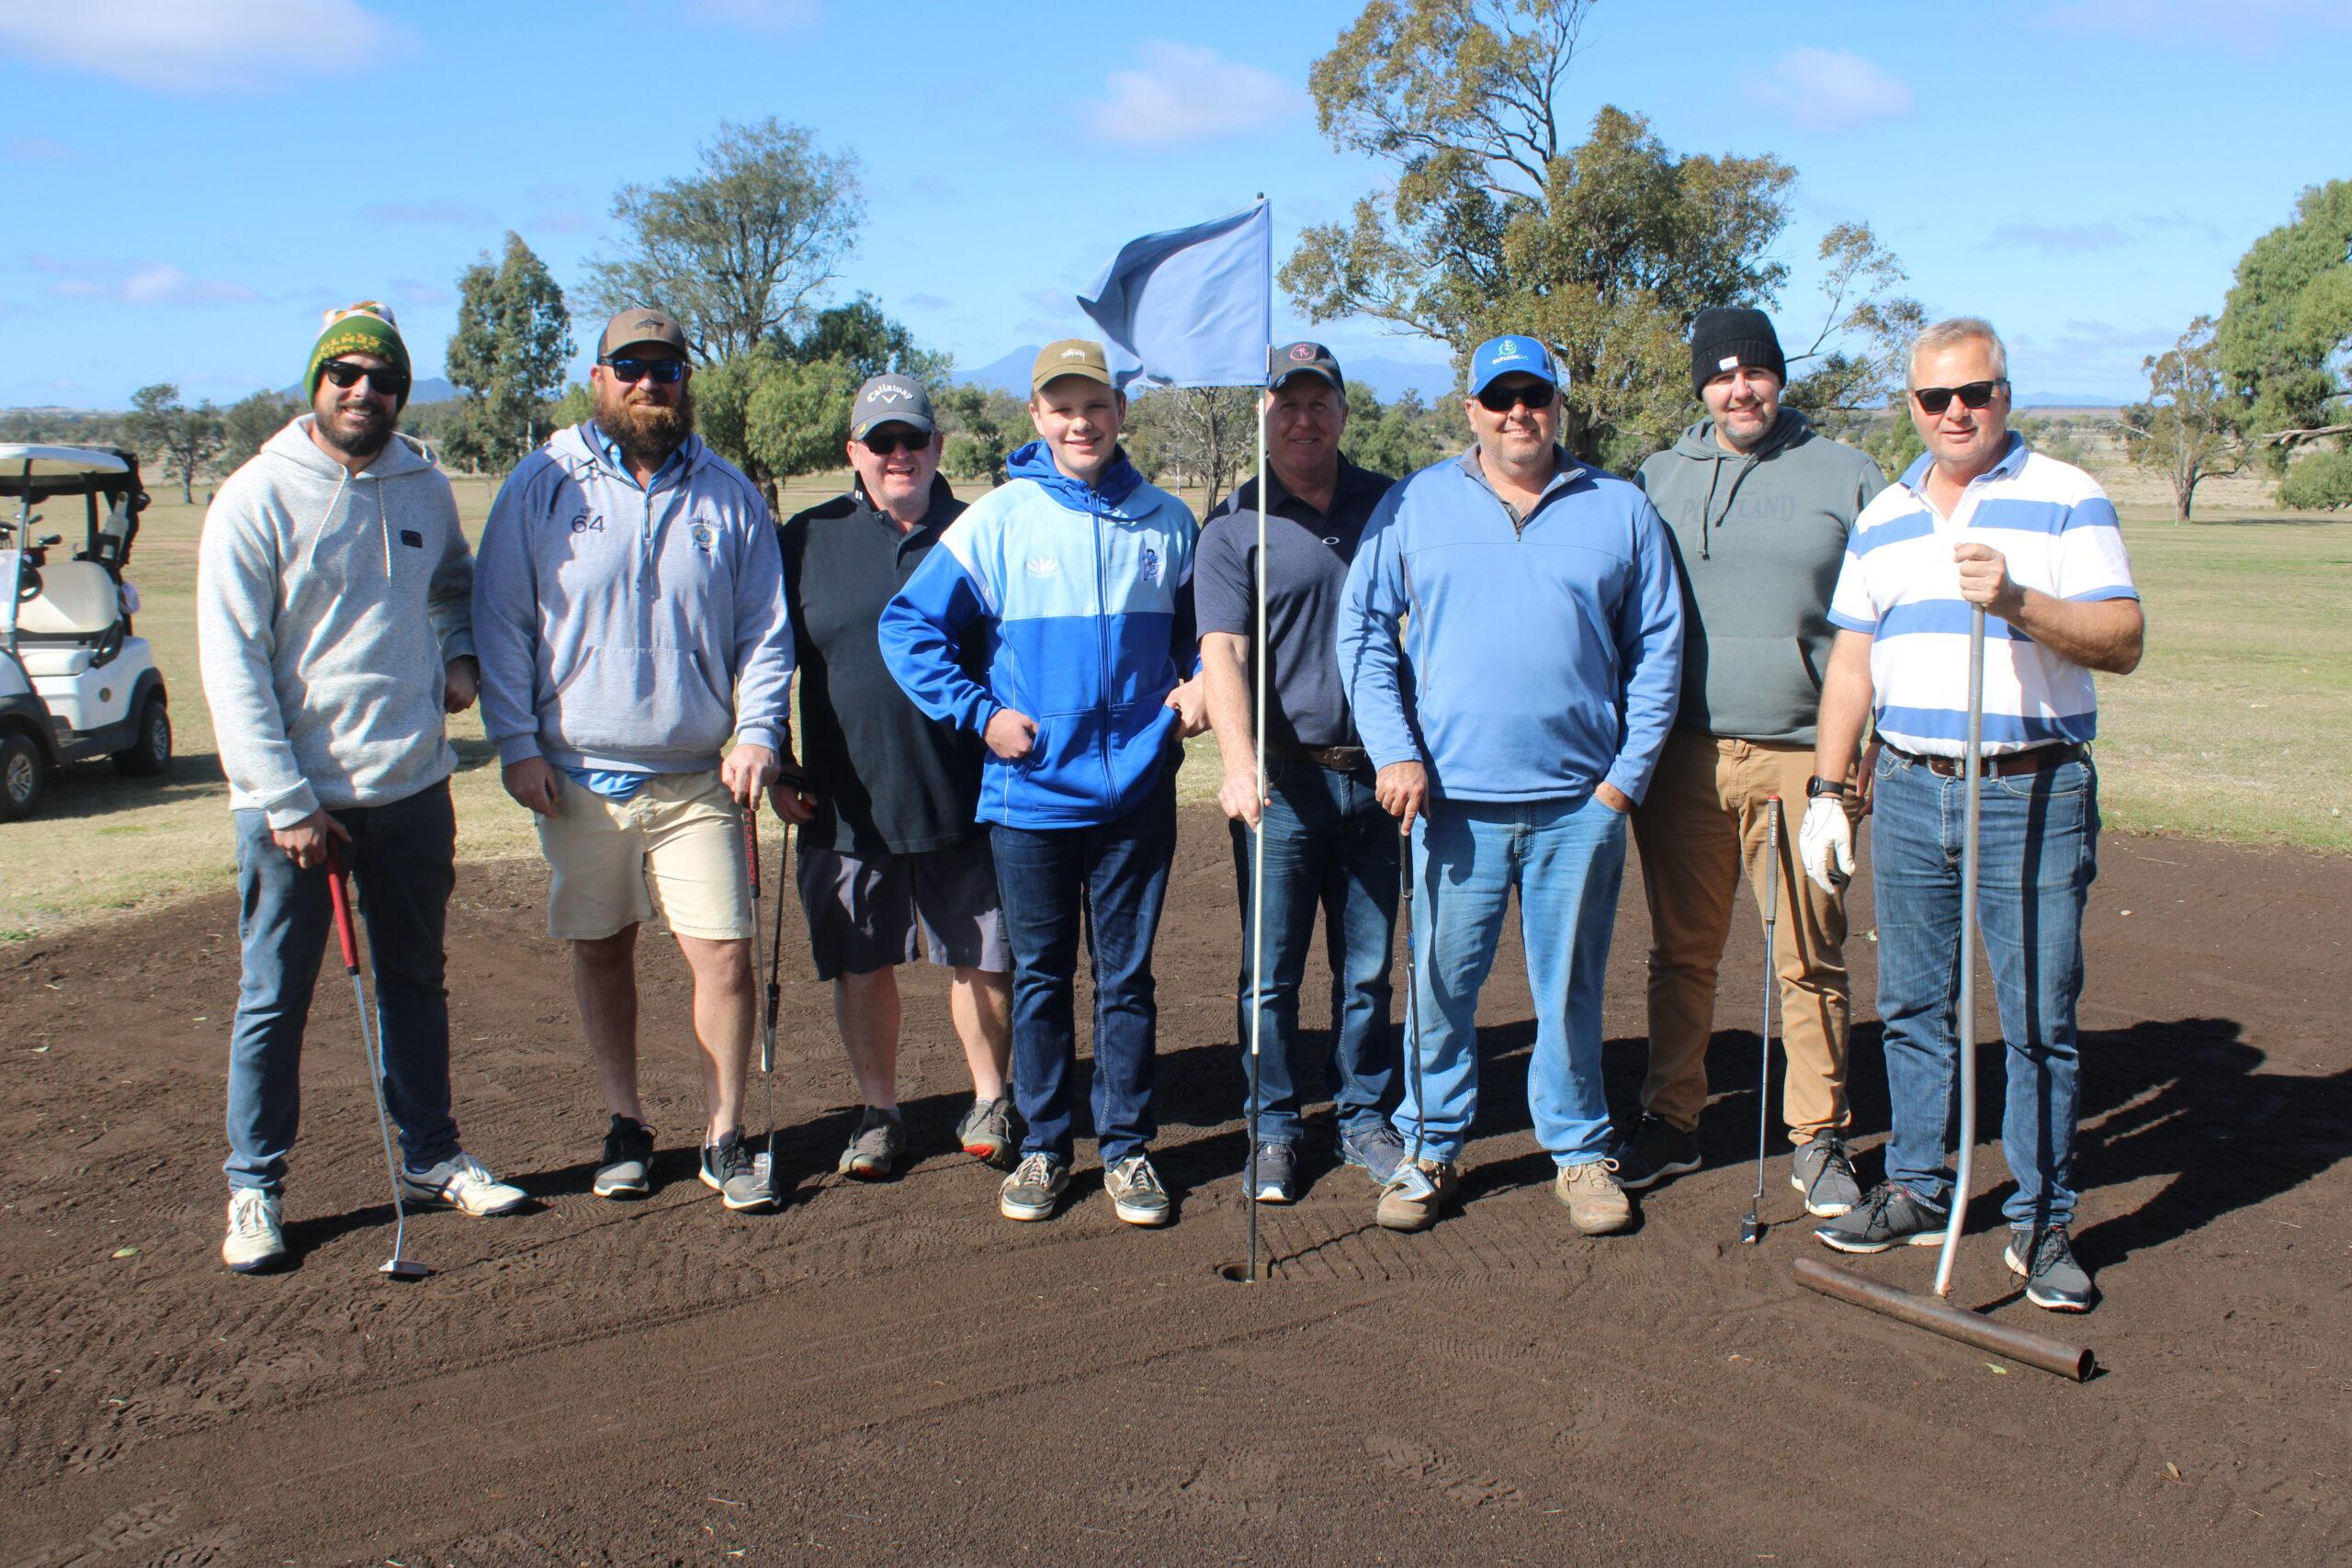 Bellata Golf Club hosts annual men's open day